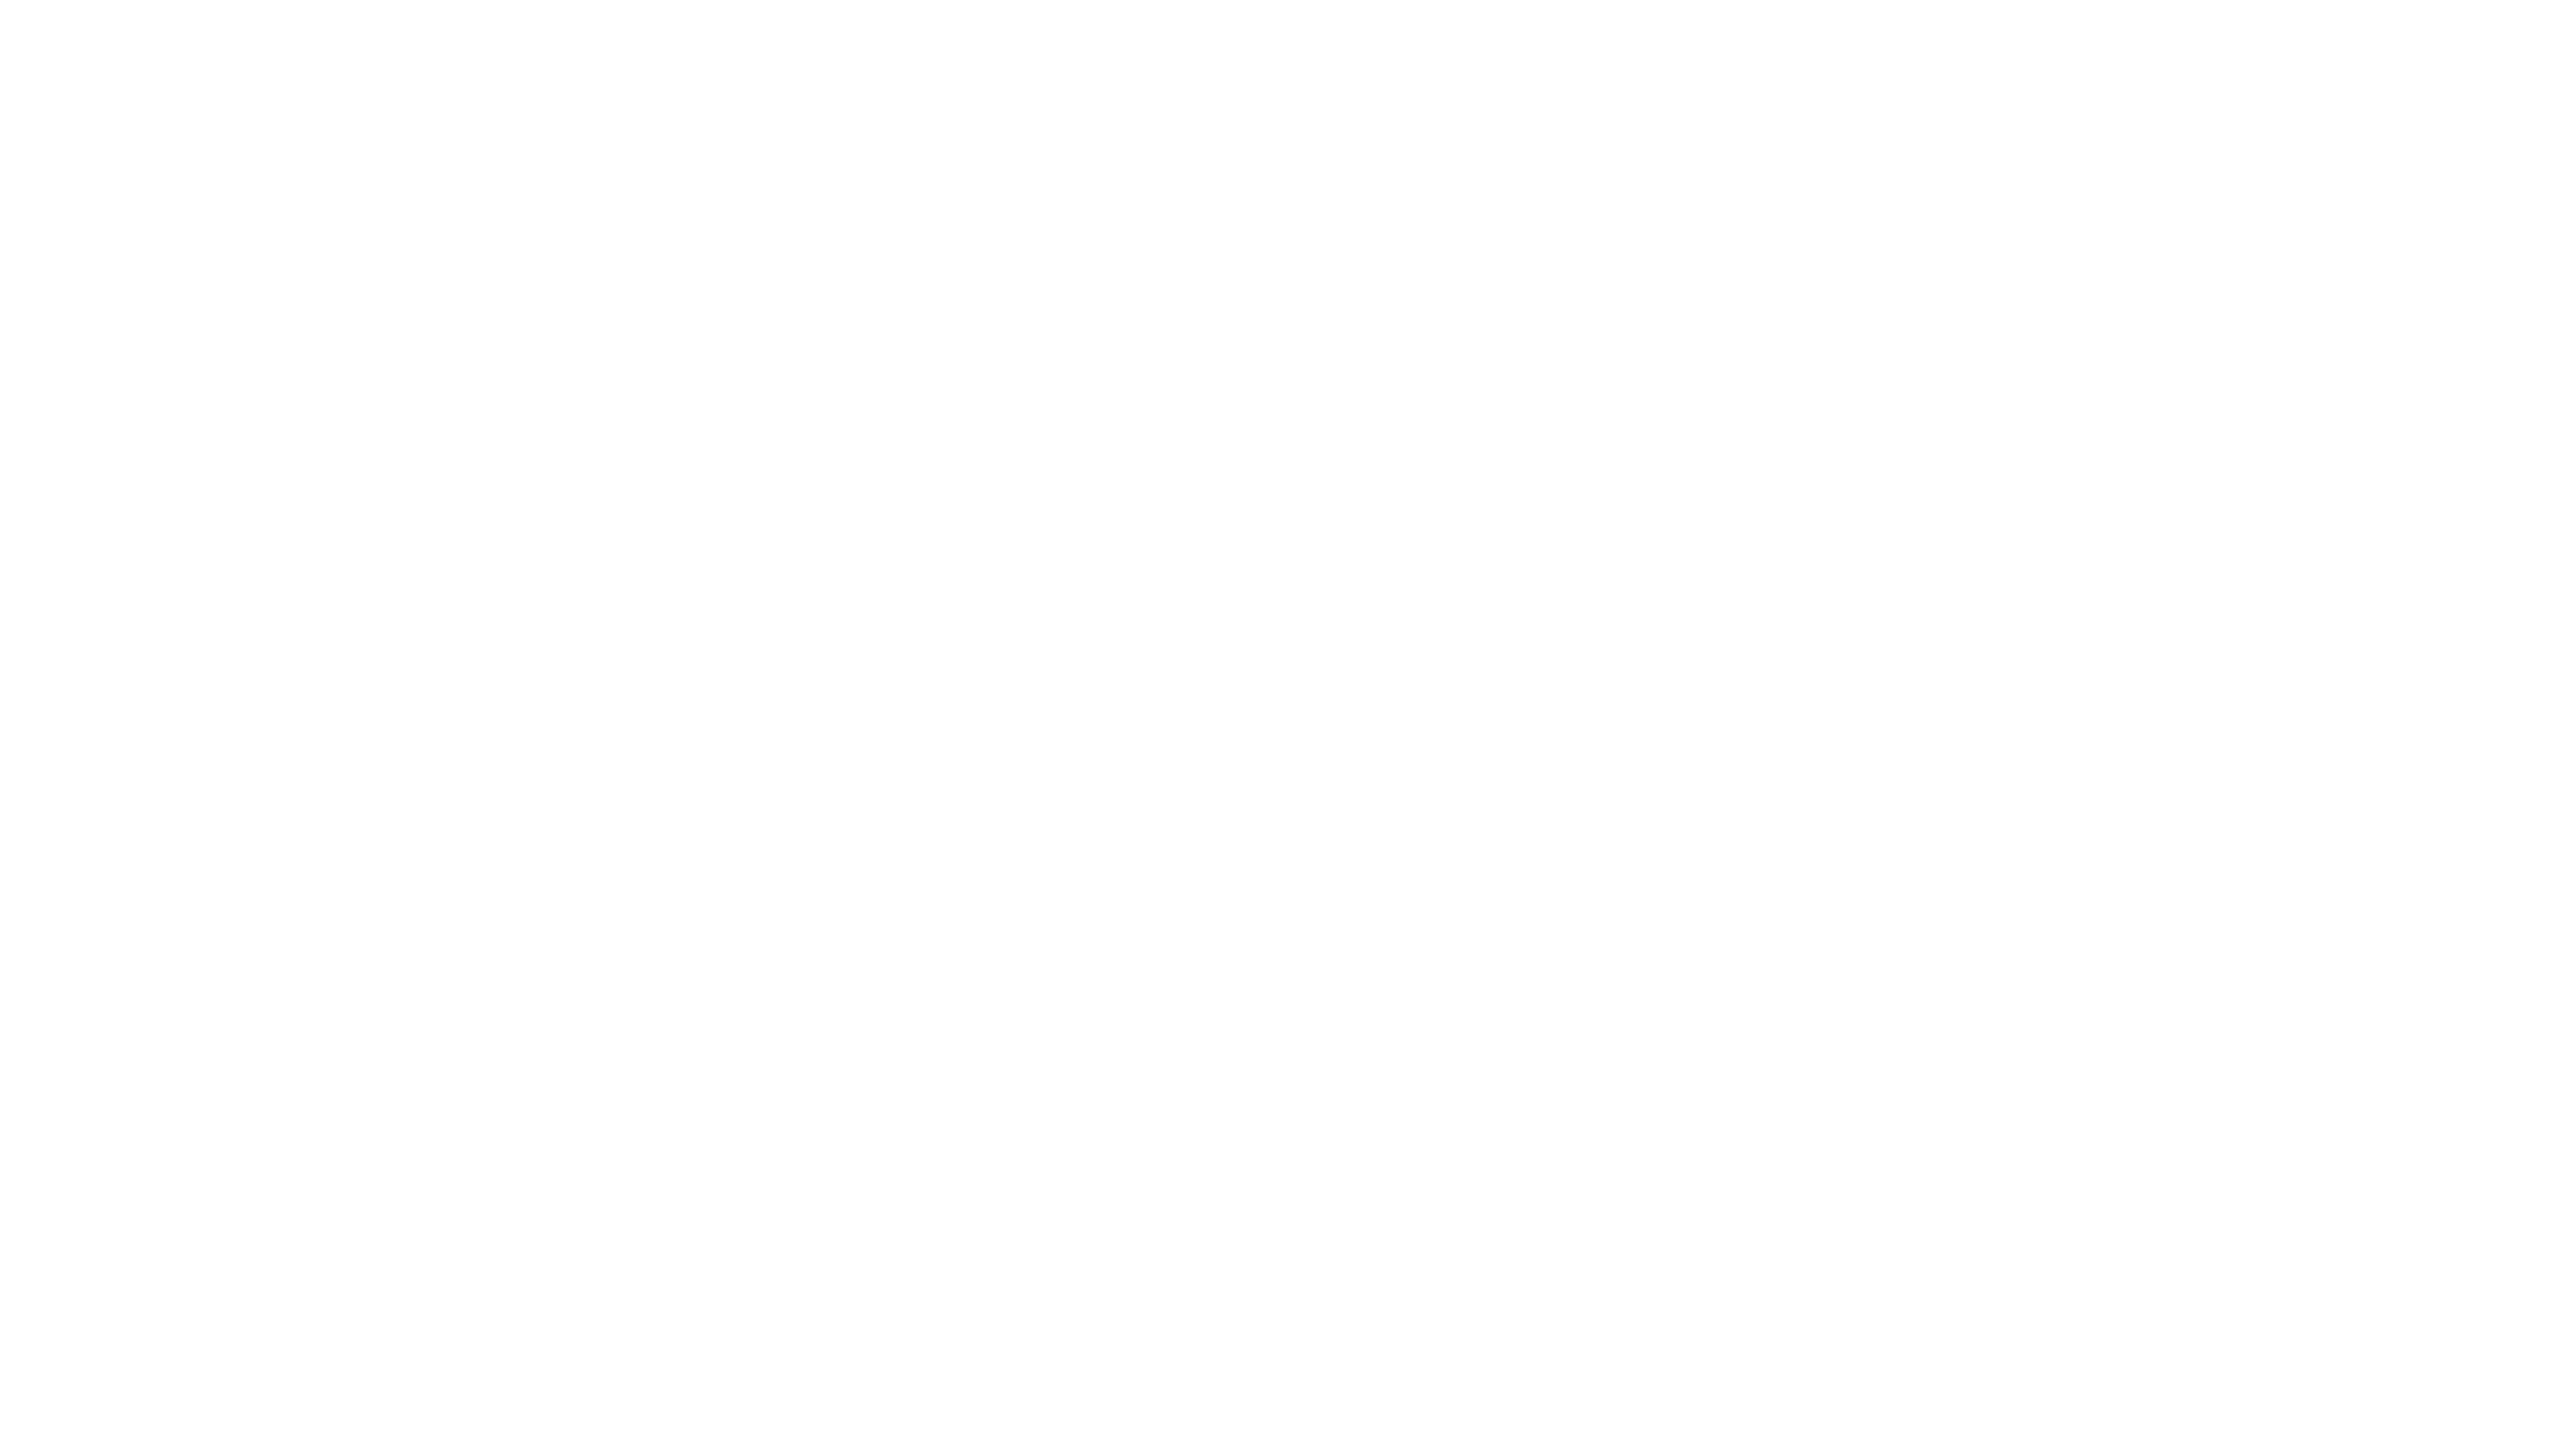 build-02